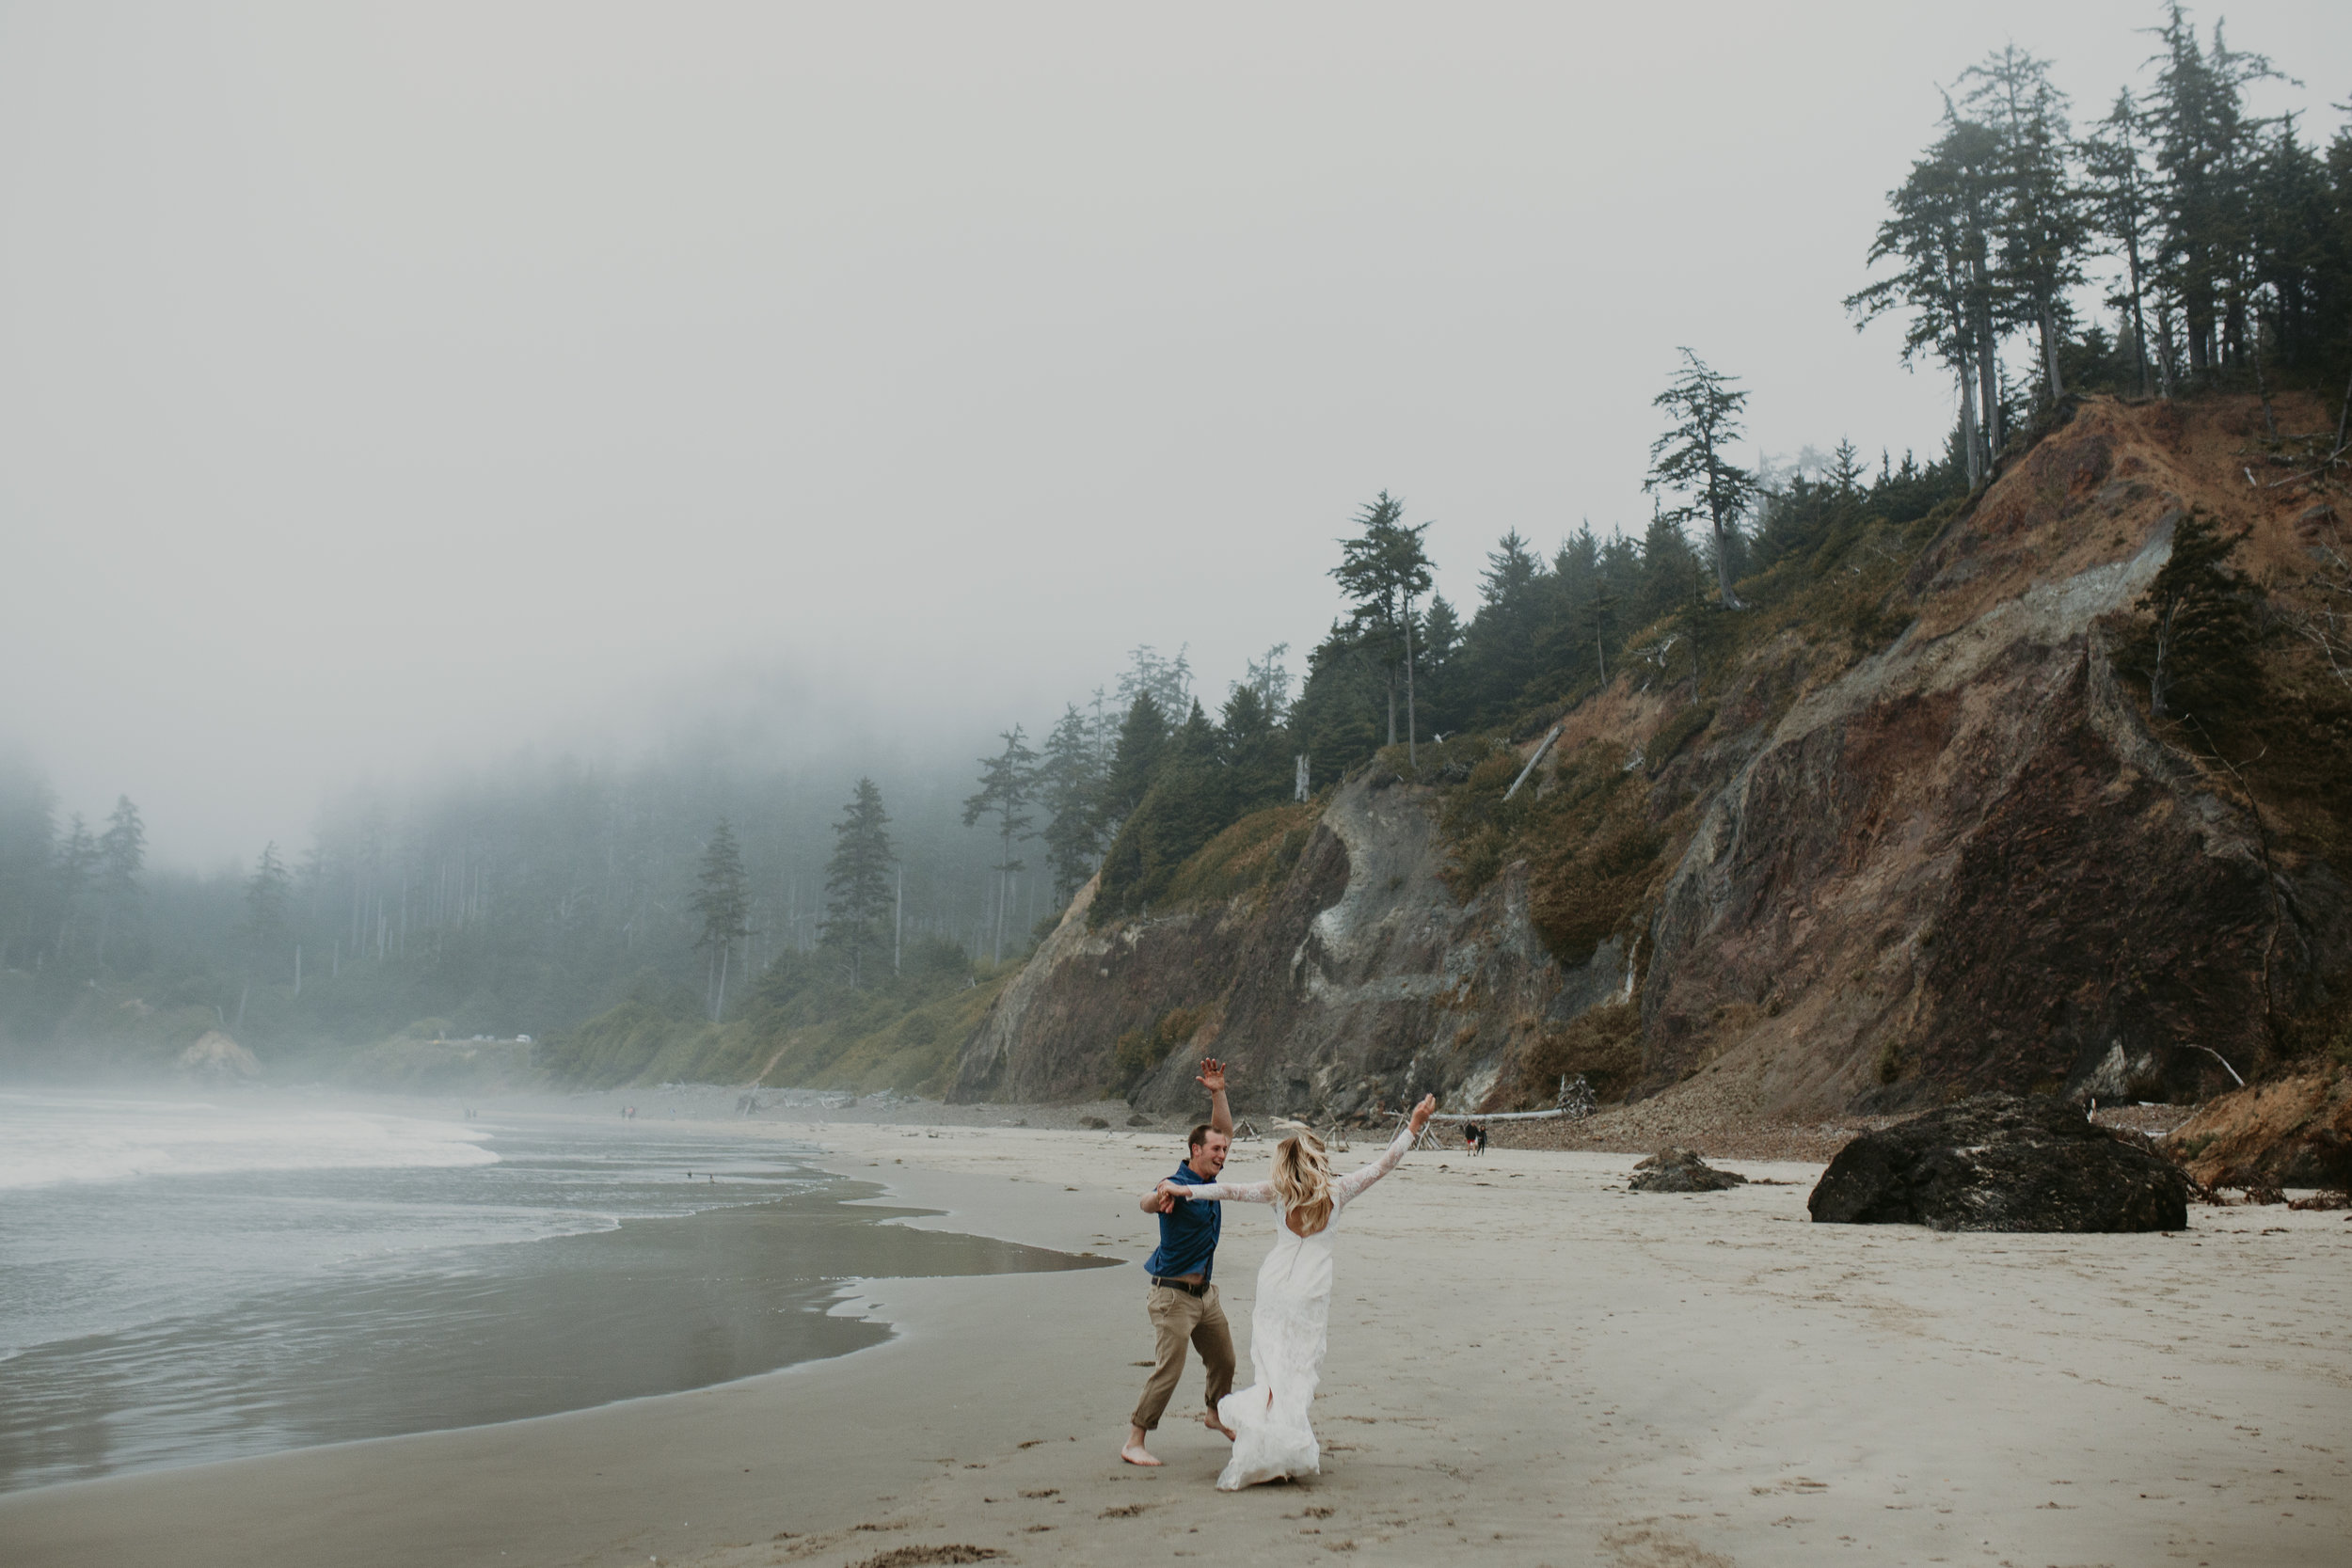 nicole-daacke-photography-ecola-state-park-oregon-elopement-bridal-photos-photographer-for-cannon-beach-elopement-oregon-coast-elopement-photographer-foggy-summer-elopement-cannon-beach-best-adventure-elopement-photographer-7052.jpg